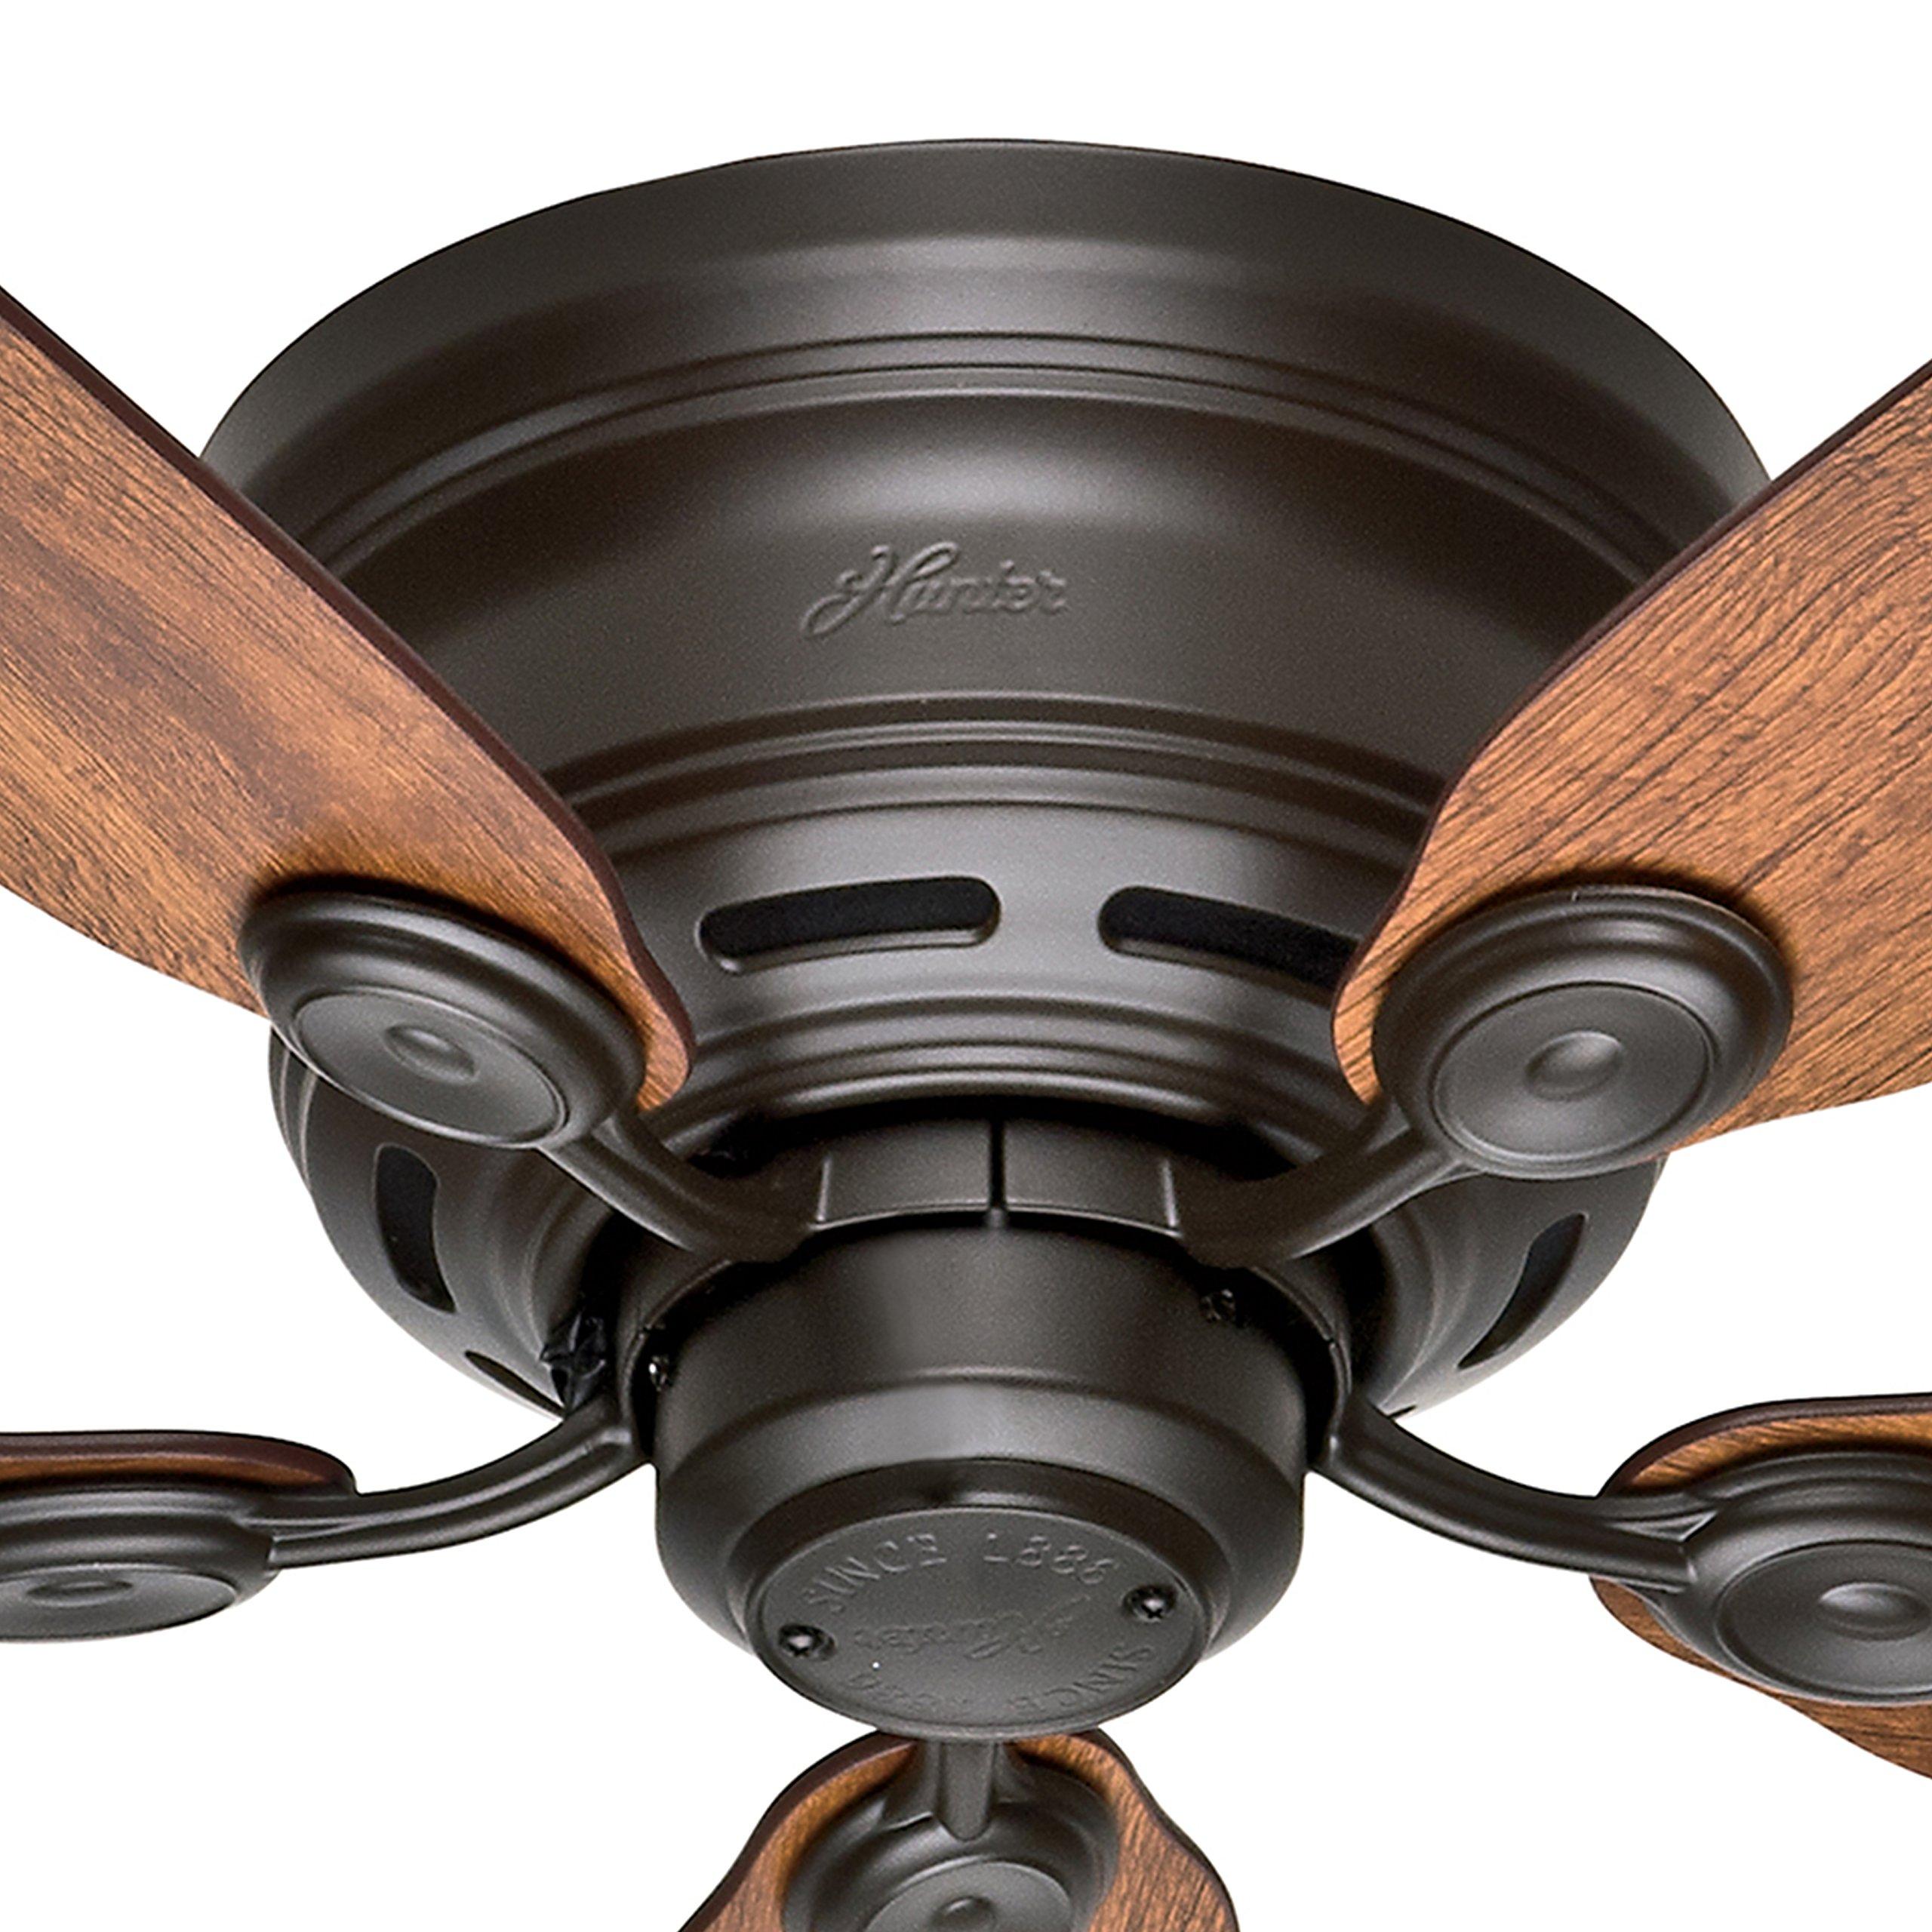 Hunter Fan 42'' New Bronze Finish Low Profile Ceiling Fan with Reversible Weathered Oak / Wine Country Blades (Certified Refurbished) by Hunter Fan Company (Image #2)